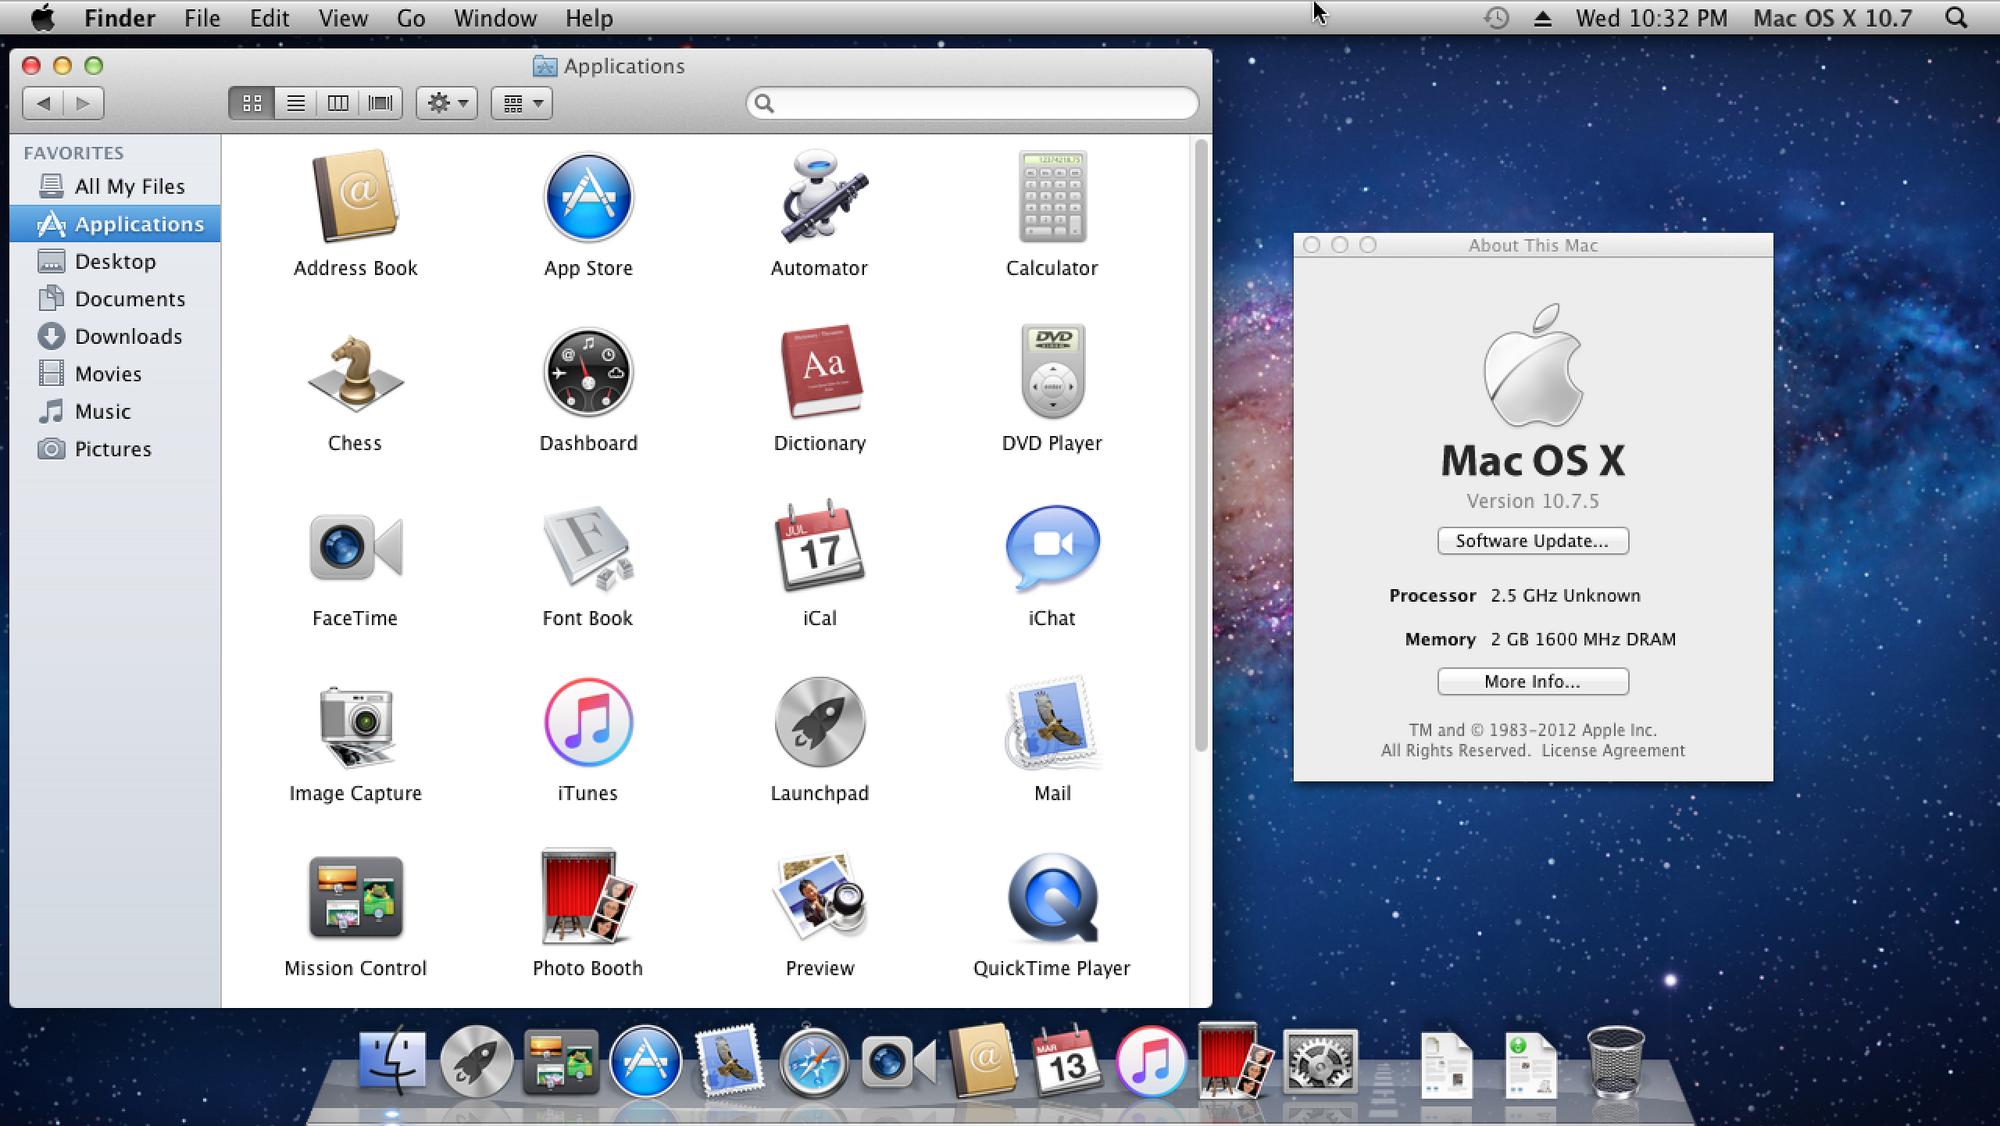 how to take a screenshot on mac os x 10.7.5